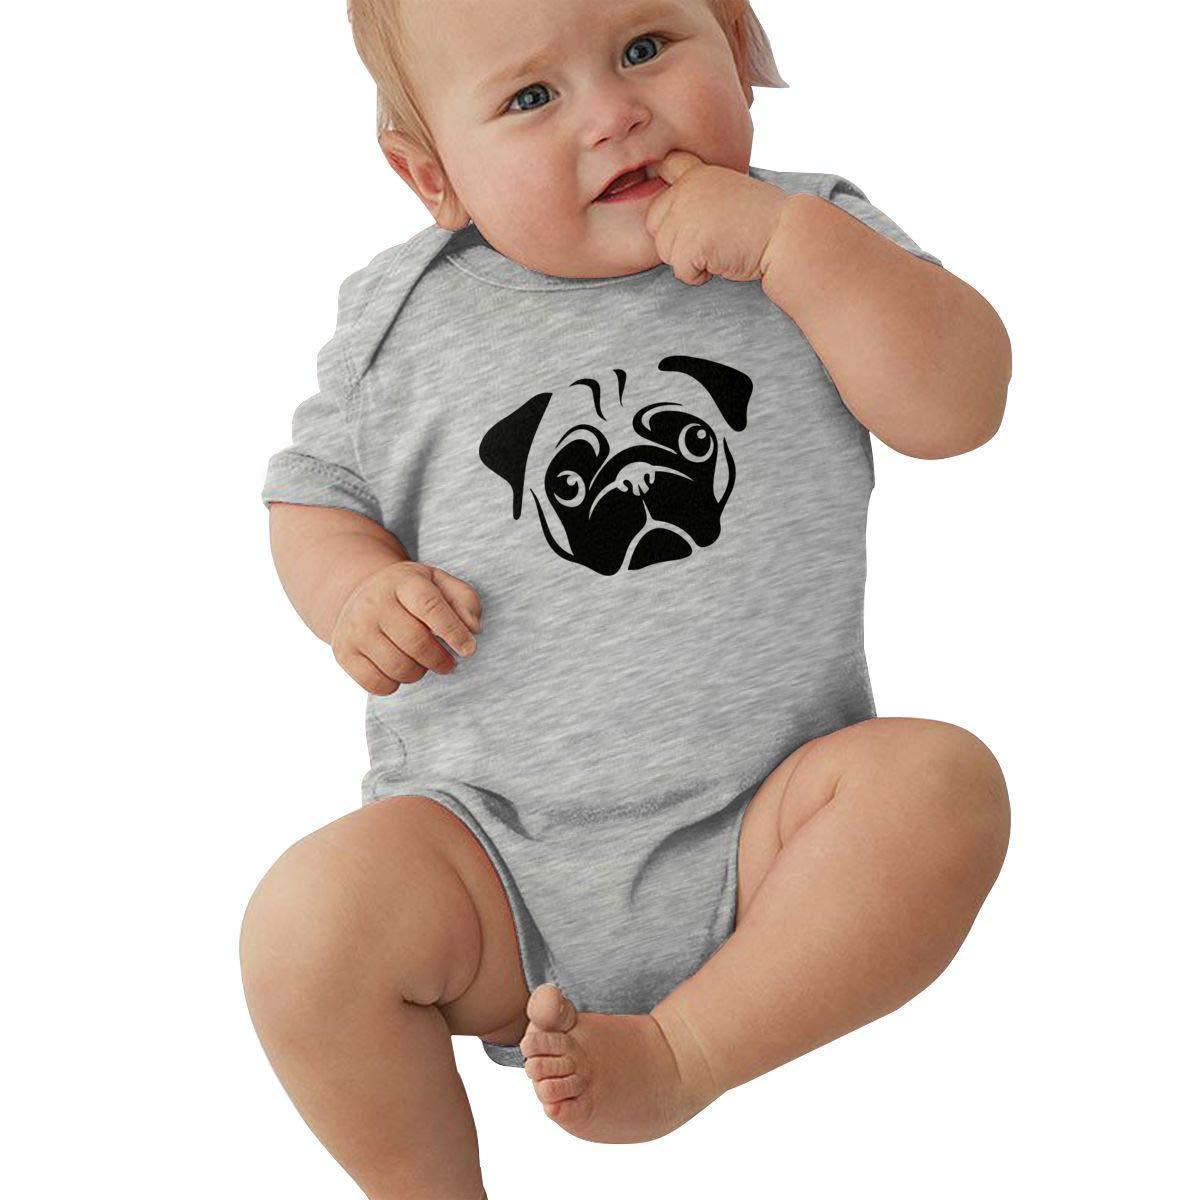 Infant Baby Girl Boy Pug BodysuitRomper Jumpsuit Short Sleeve Bodysuit Tops Clothes